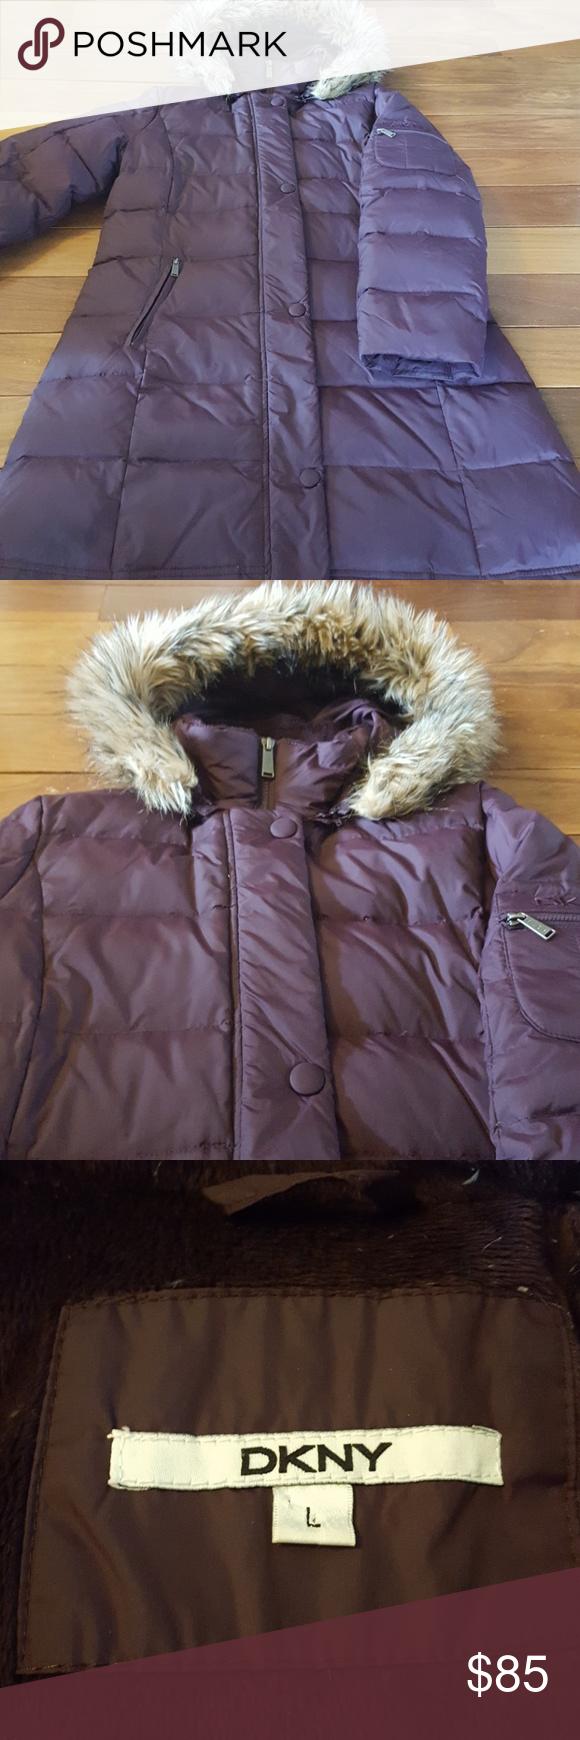 Dkny Down Coat Excellent Condition 3 Outer Zip Pockets Detachable Hood Deep Plum Color Last Pic Shows Color Best Warm And Cozy Dkny Down Coat Dkny Coat [ 1740 x 580 Pixel ]